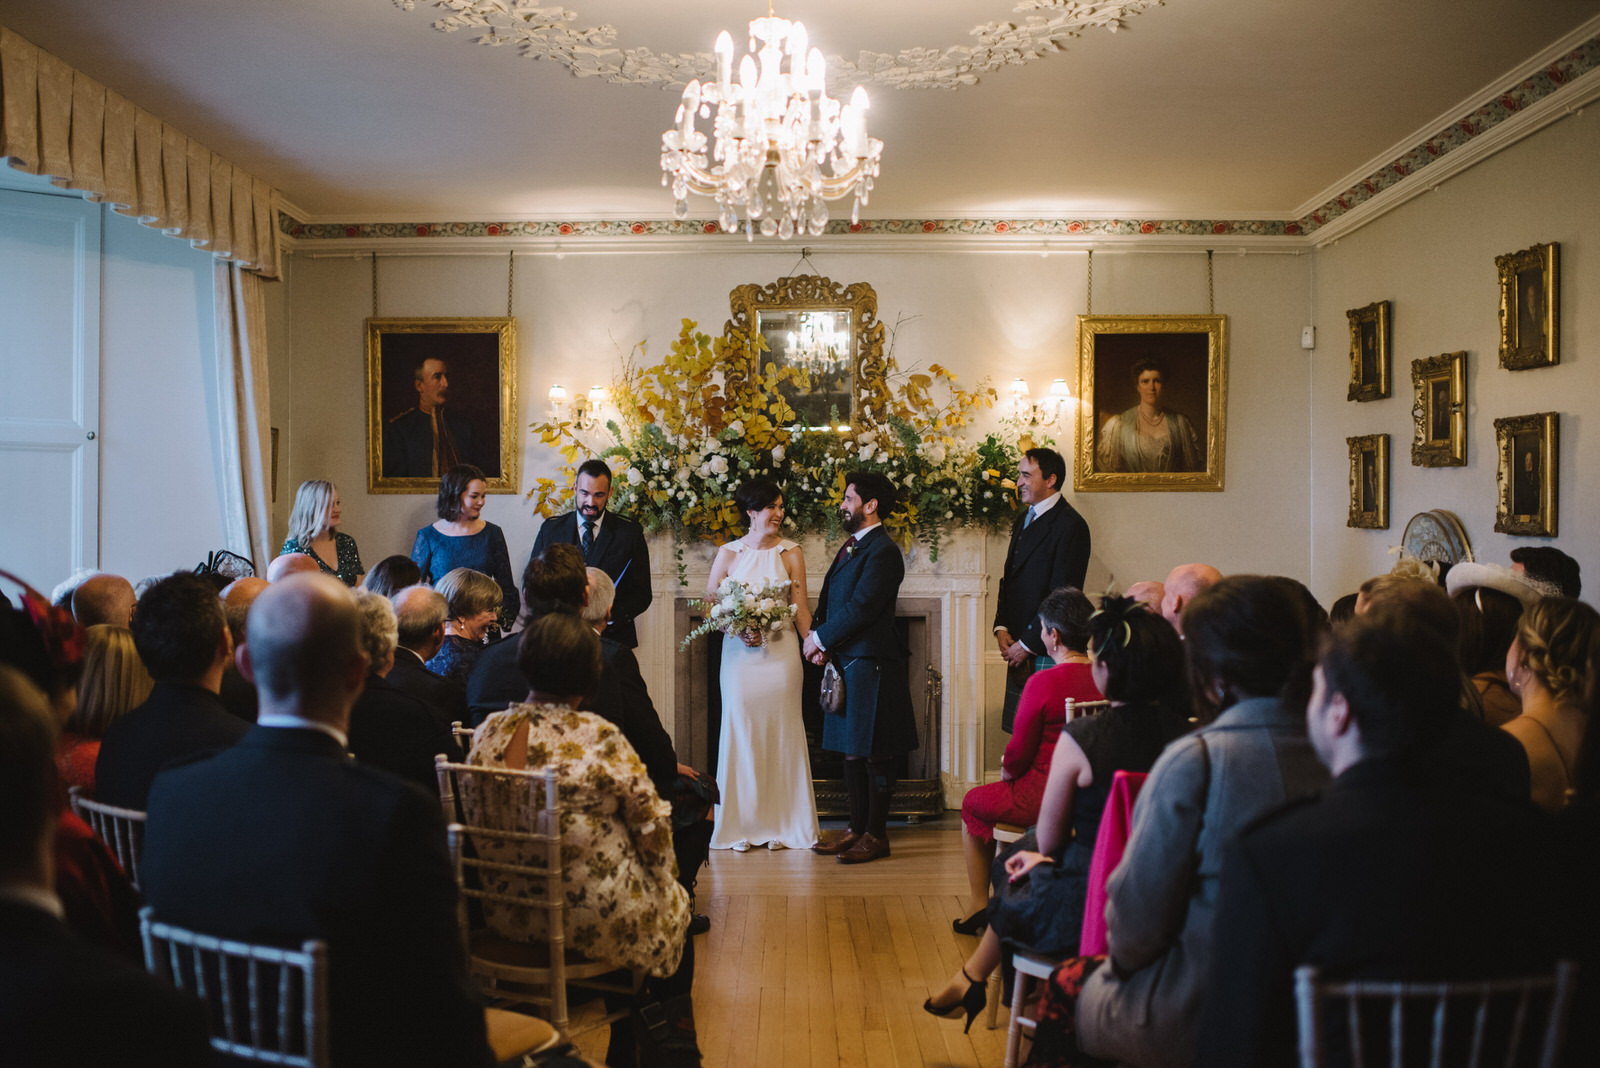 030-COLSTOUN-HOUSE-WEDDING-ALTERNATIVE-WEDDING-PHOTOGRAPHER-GLASGOW-WEDDING-PHOTOGRAPHER-STYLISH-SCOTTISH-WEDDING.JPG